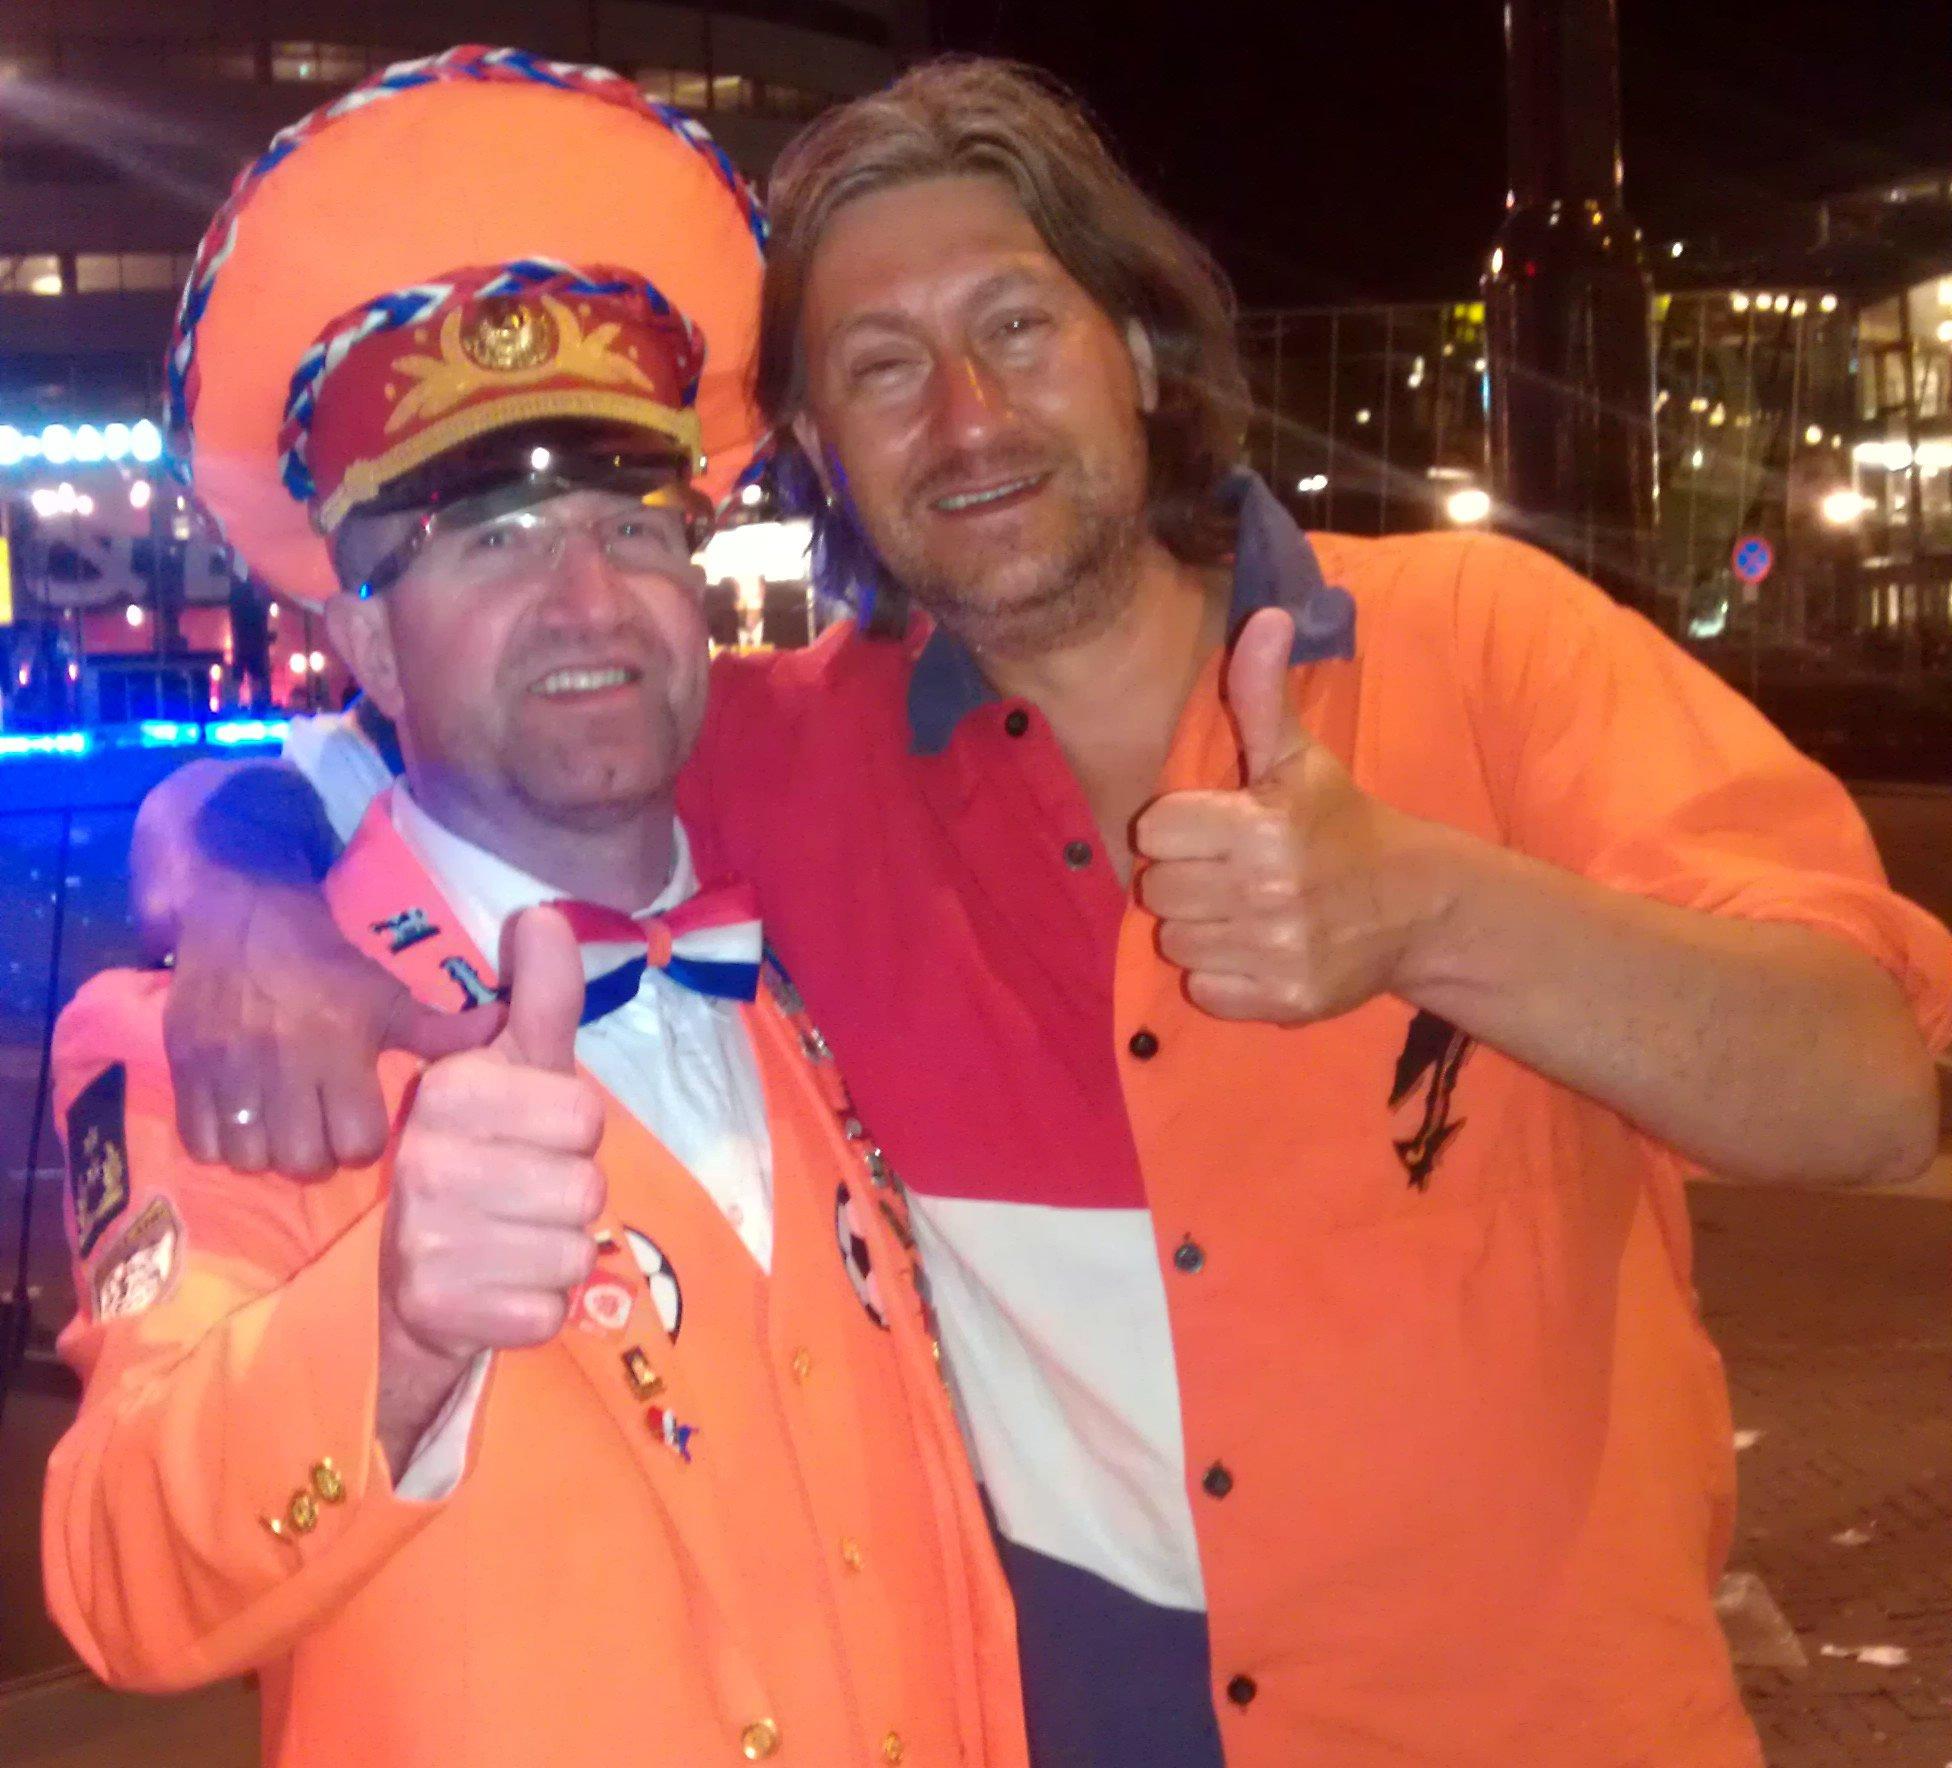 Kolonel Michael Boerop Oranje volkslied Voetbal Bier Bitterballen